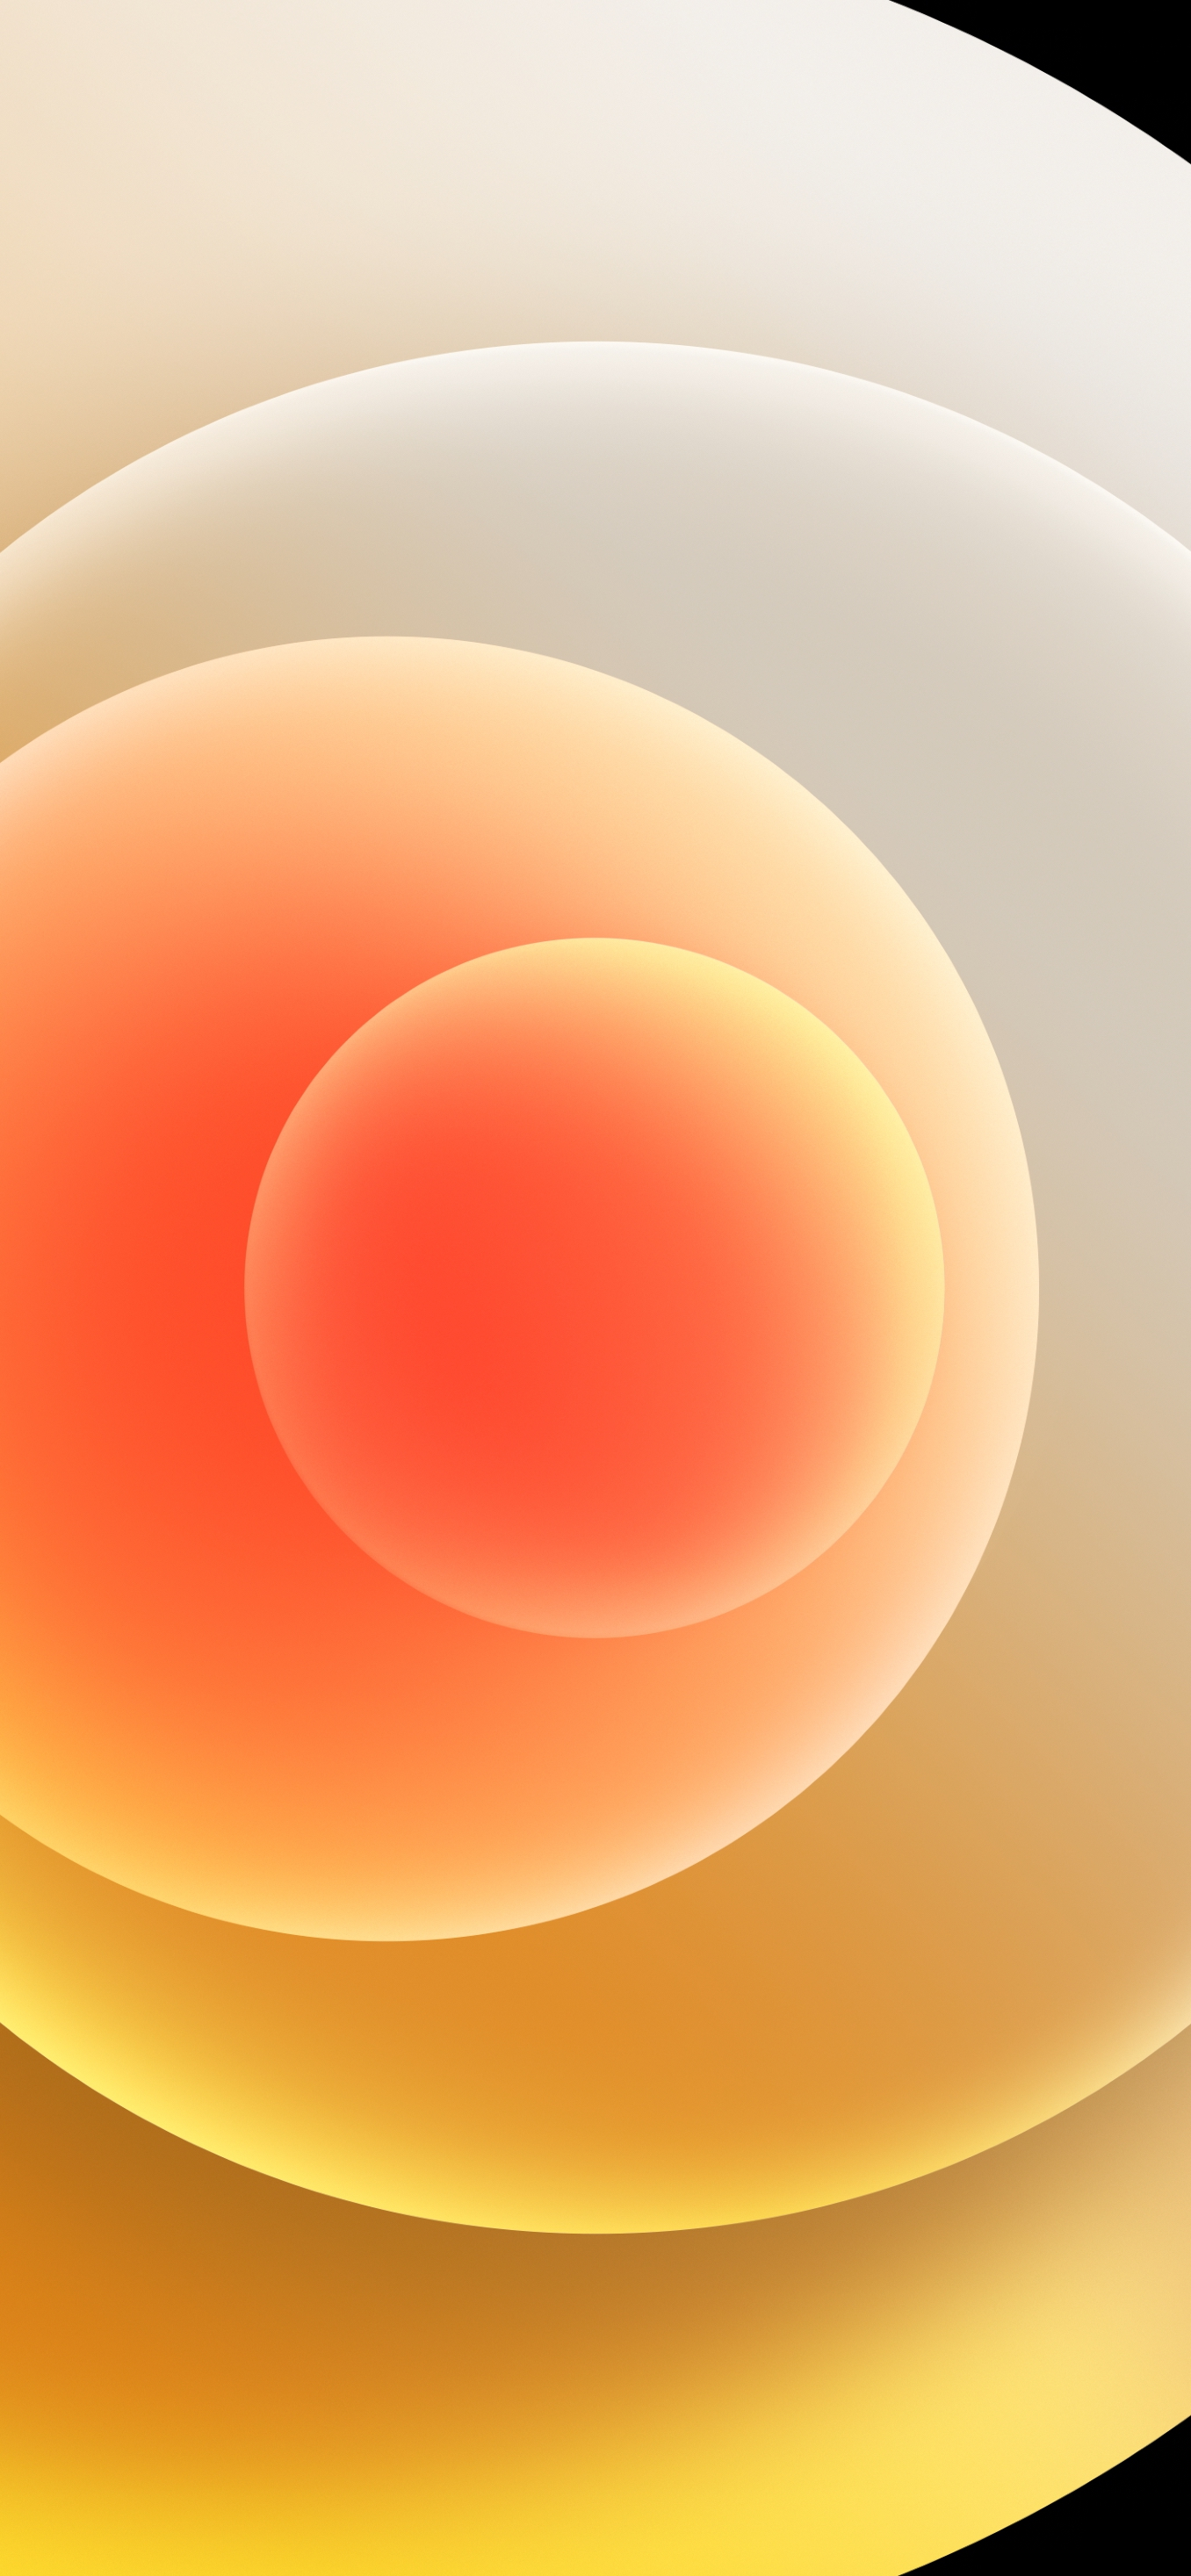 iPhone 12 Wallpaper